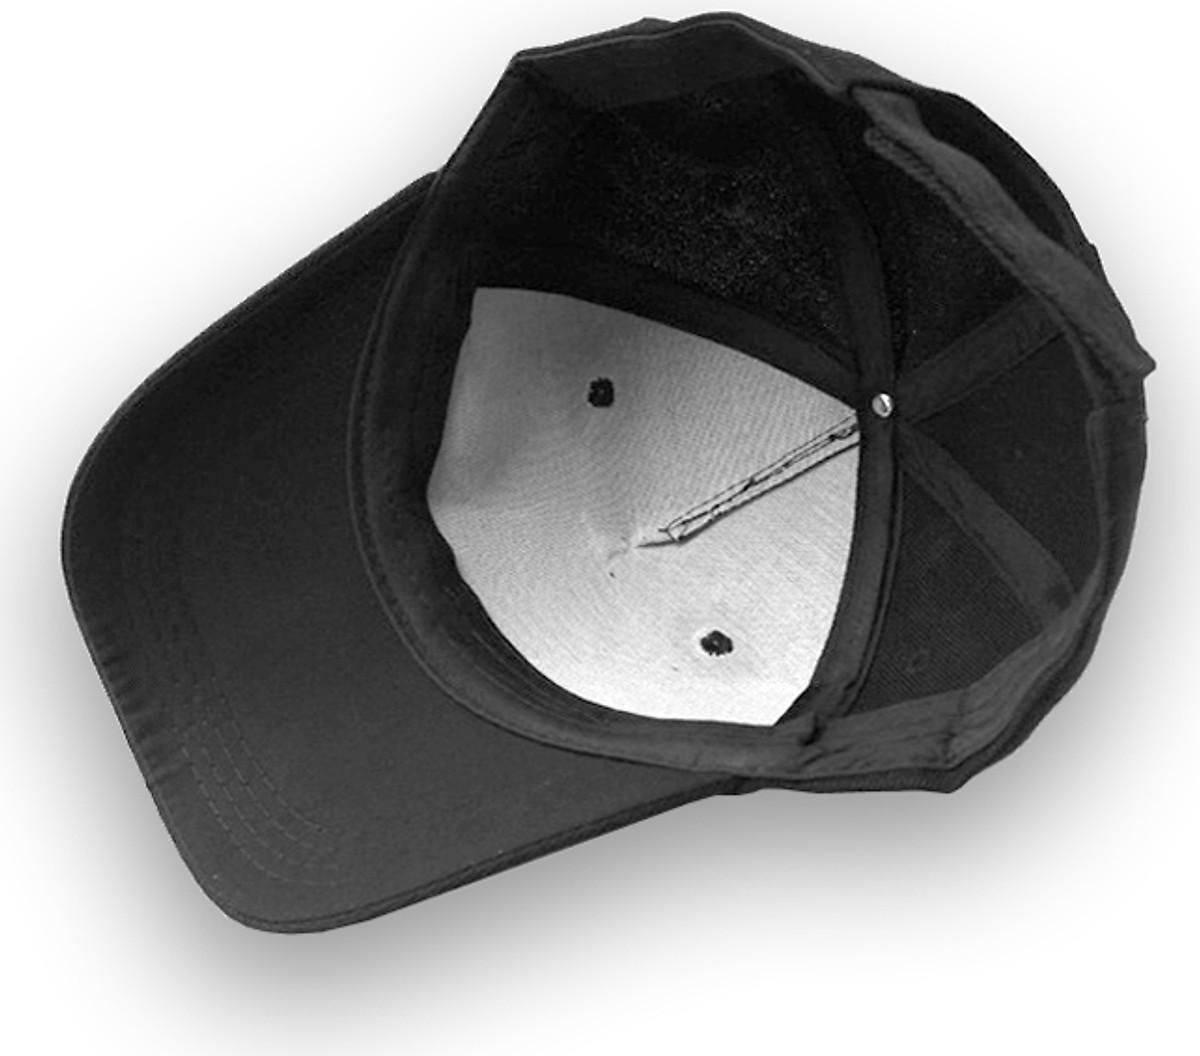 Nón Blackpink mũ lưỡi trai đen BL-01